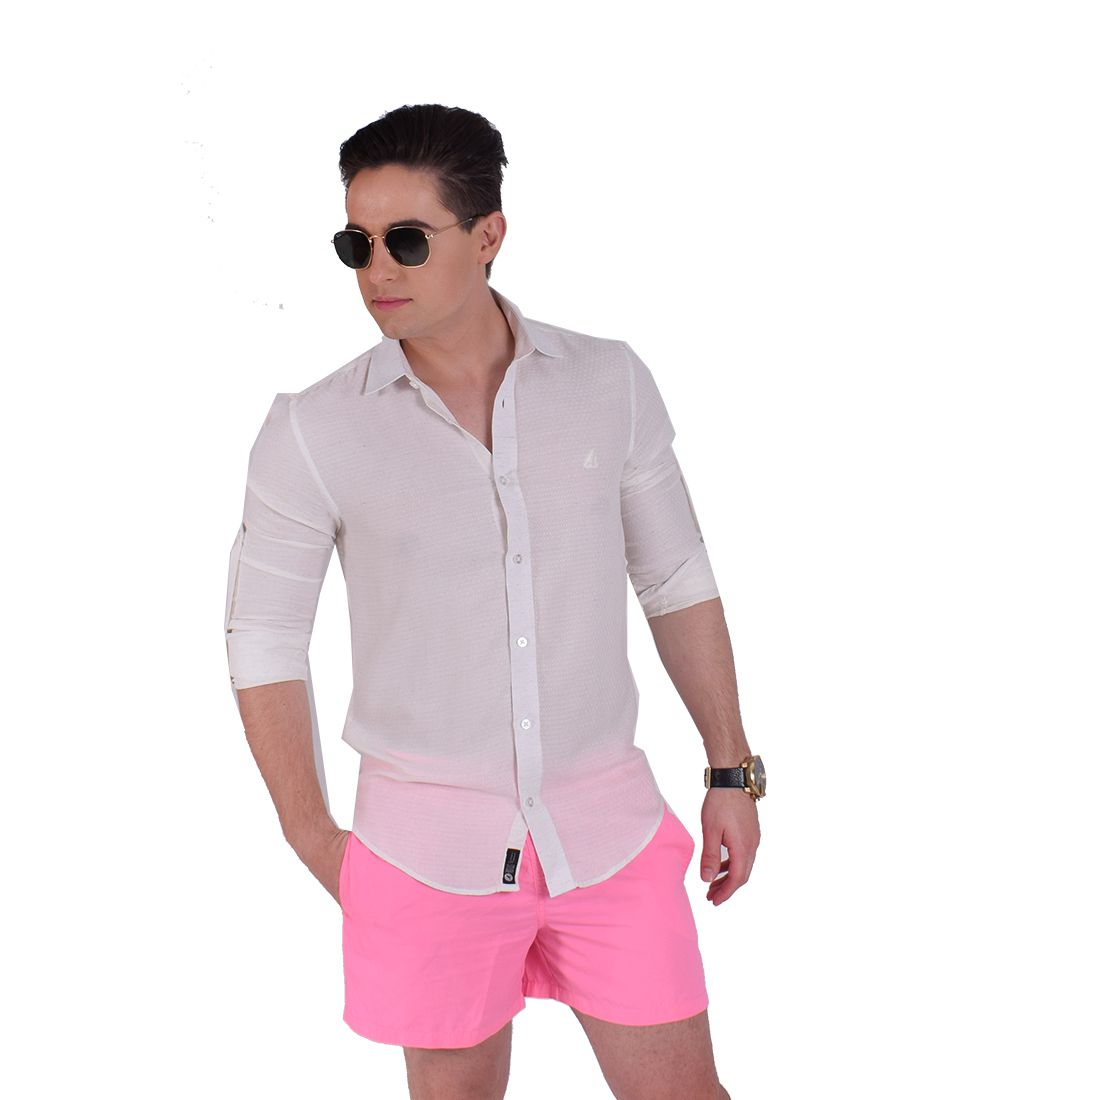 Camisa Social Masculina Branca Martingale Slim